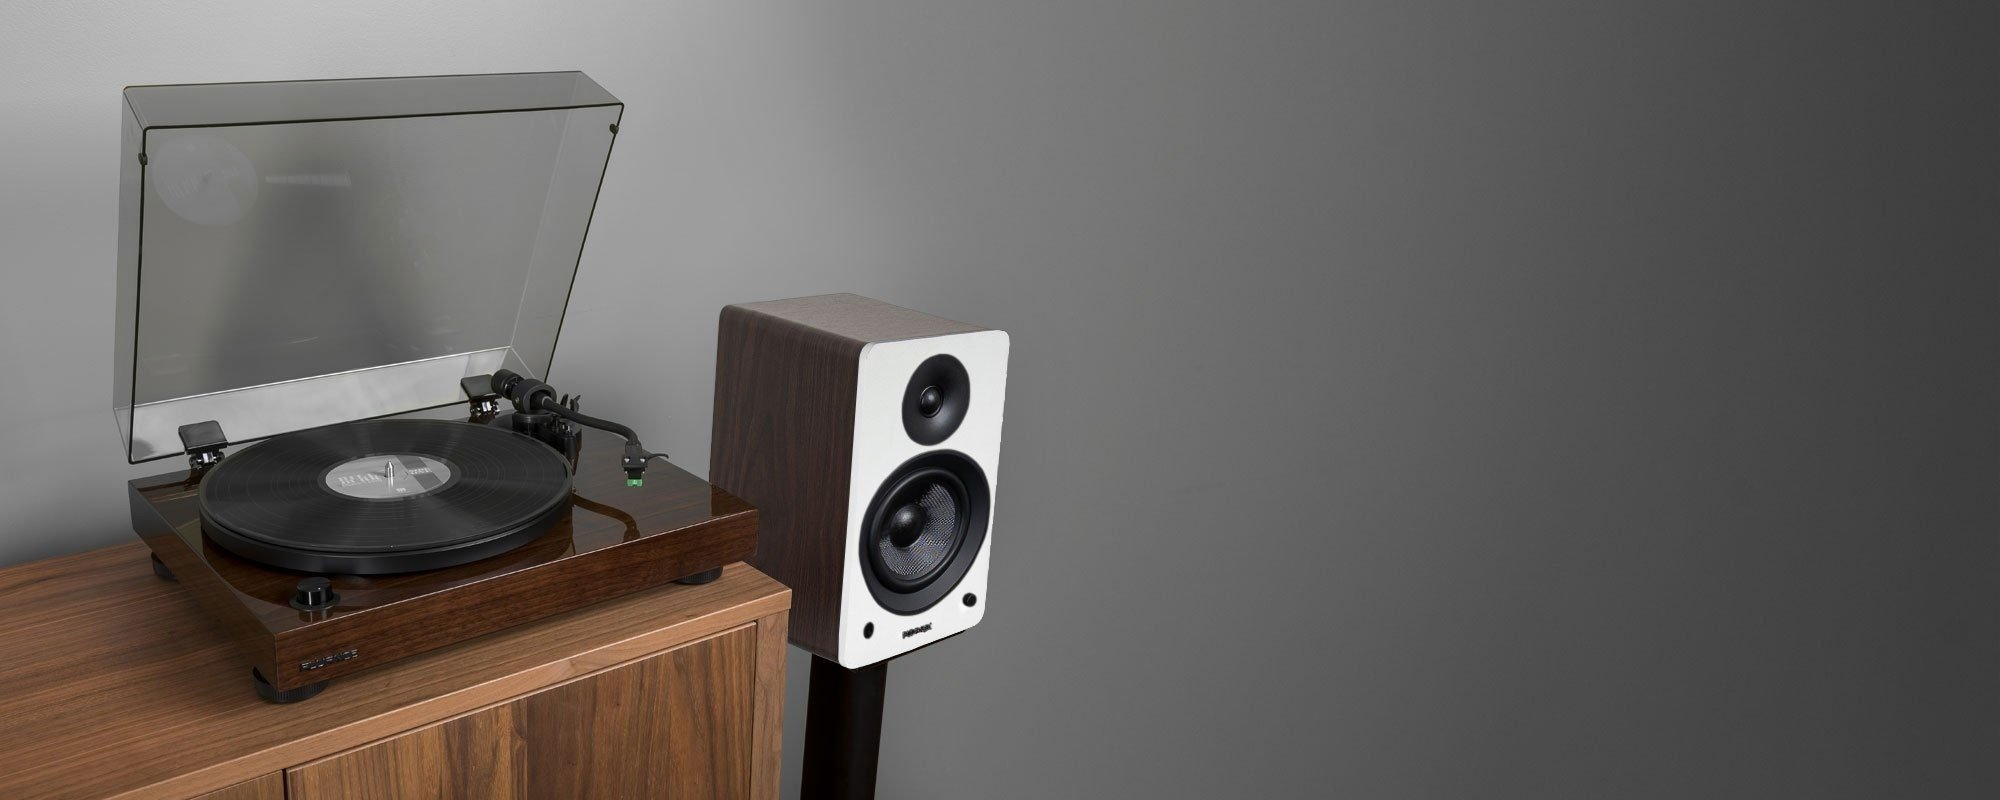 "RT81 Elite High Fidelity Vinyl Turntable with Ai61 Powered 6.5"" Stereo Bookshelf Speakers - Lifestyle"